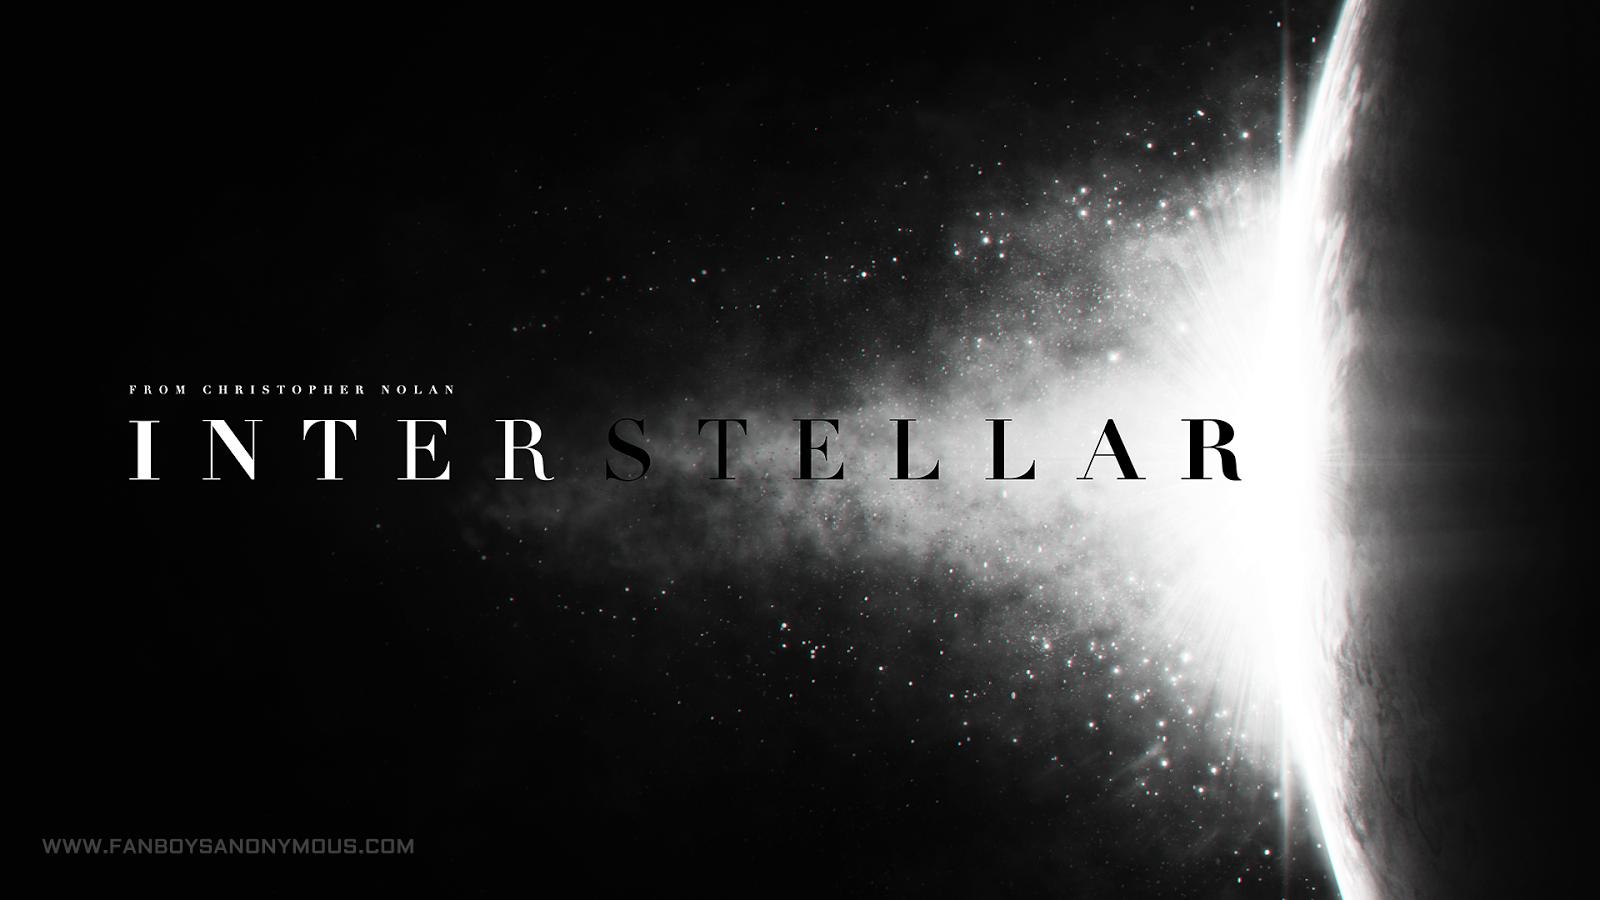 HD images Interstellar screen shots